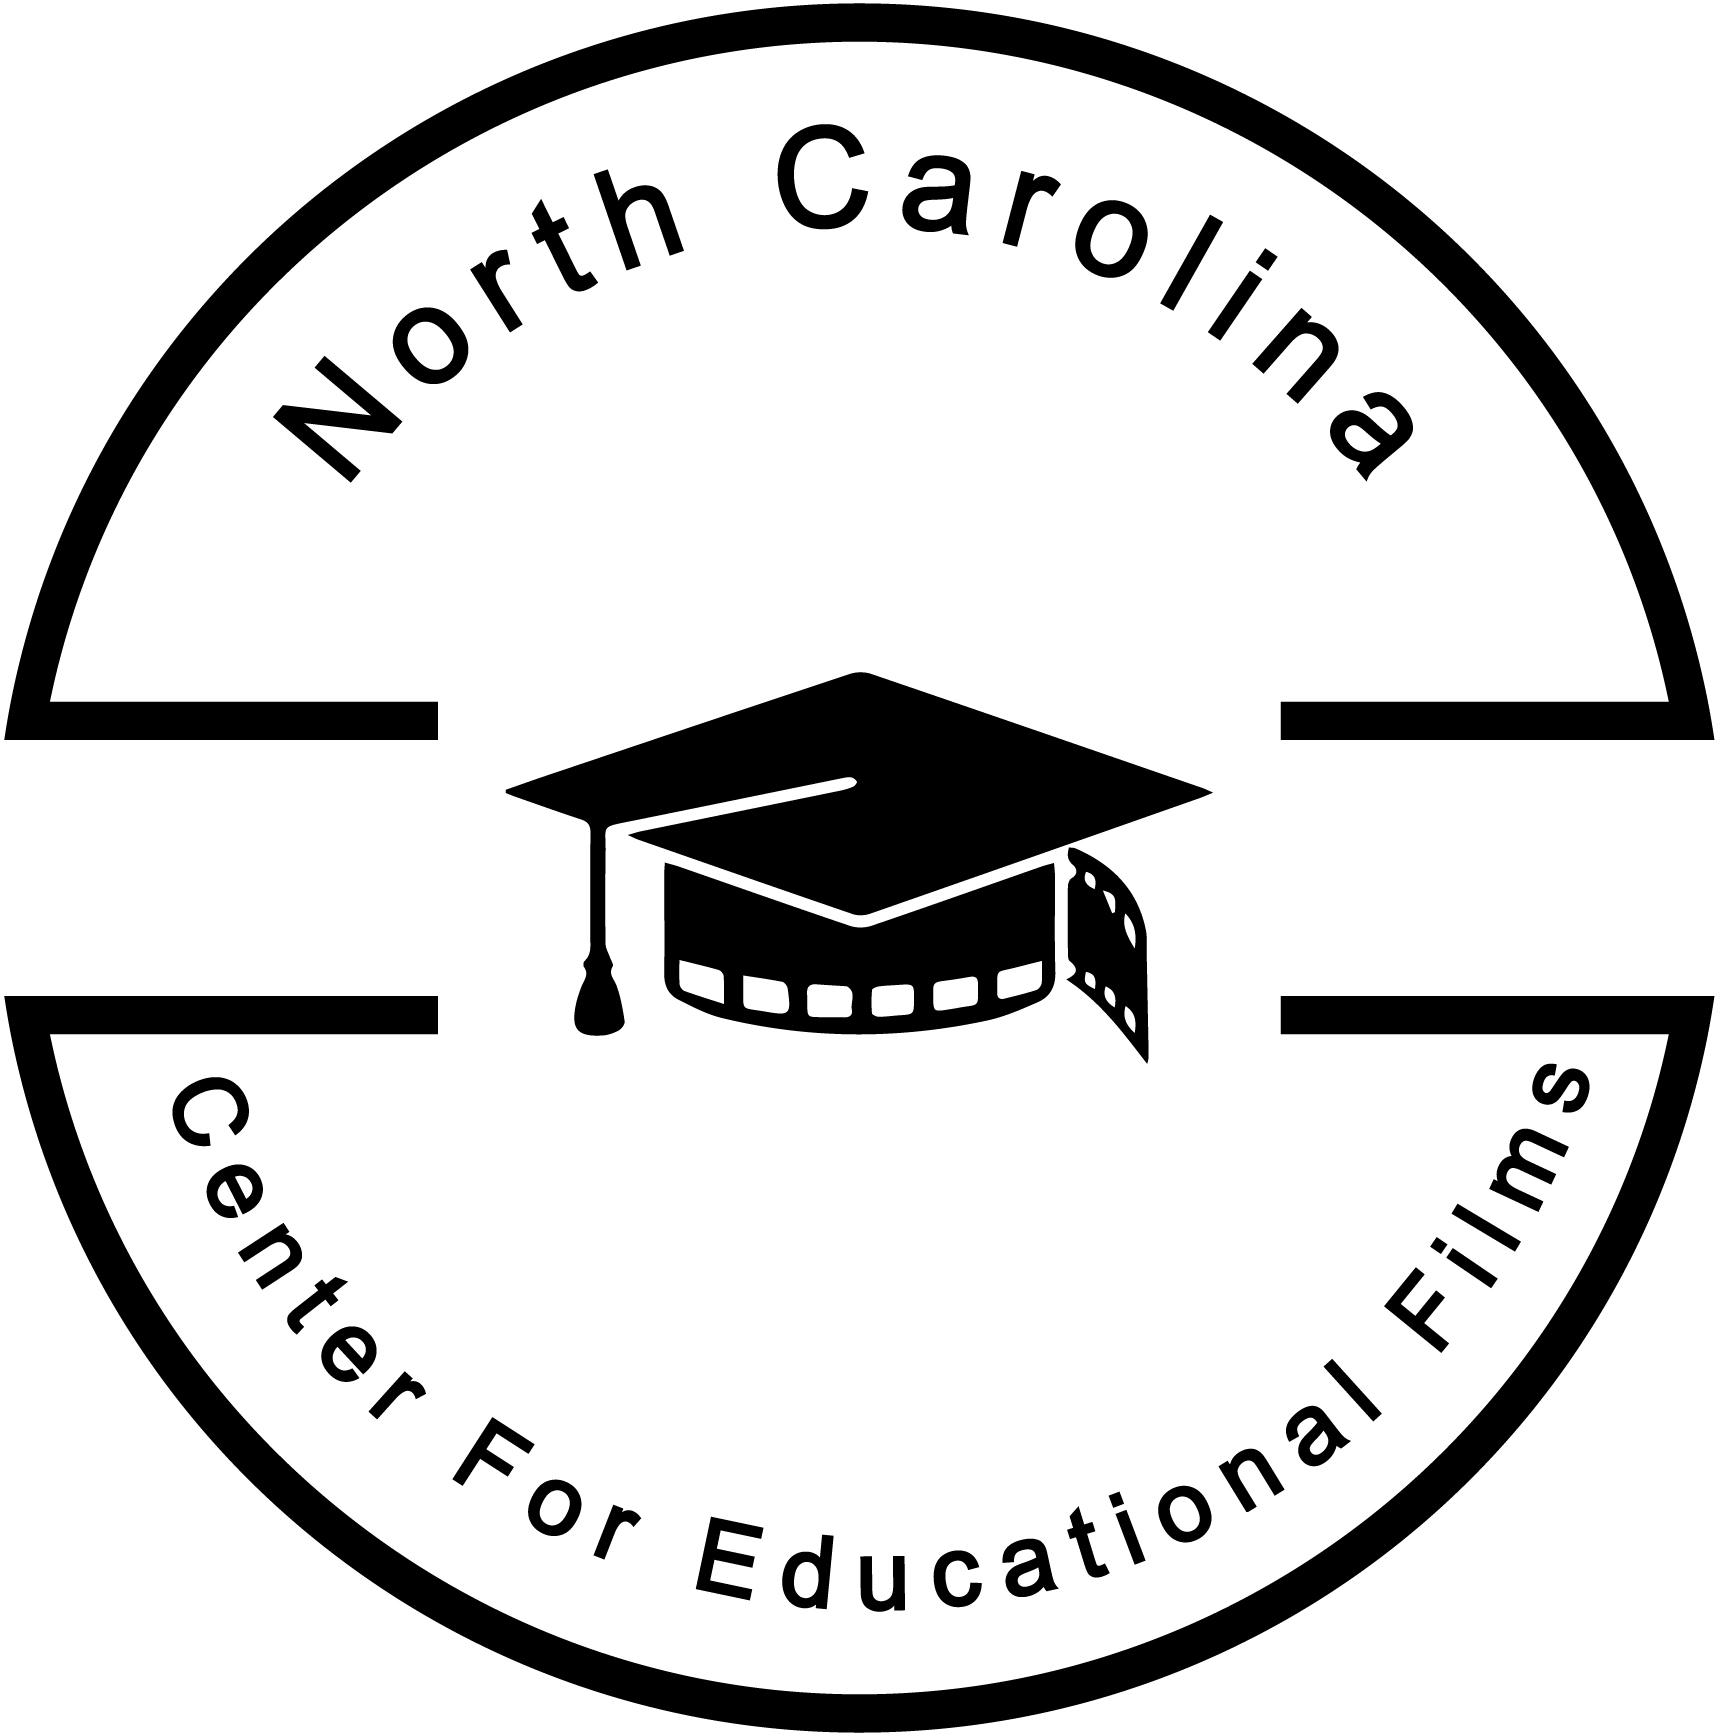 North Carolina Center for Educational Films